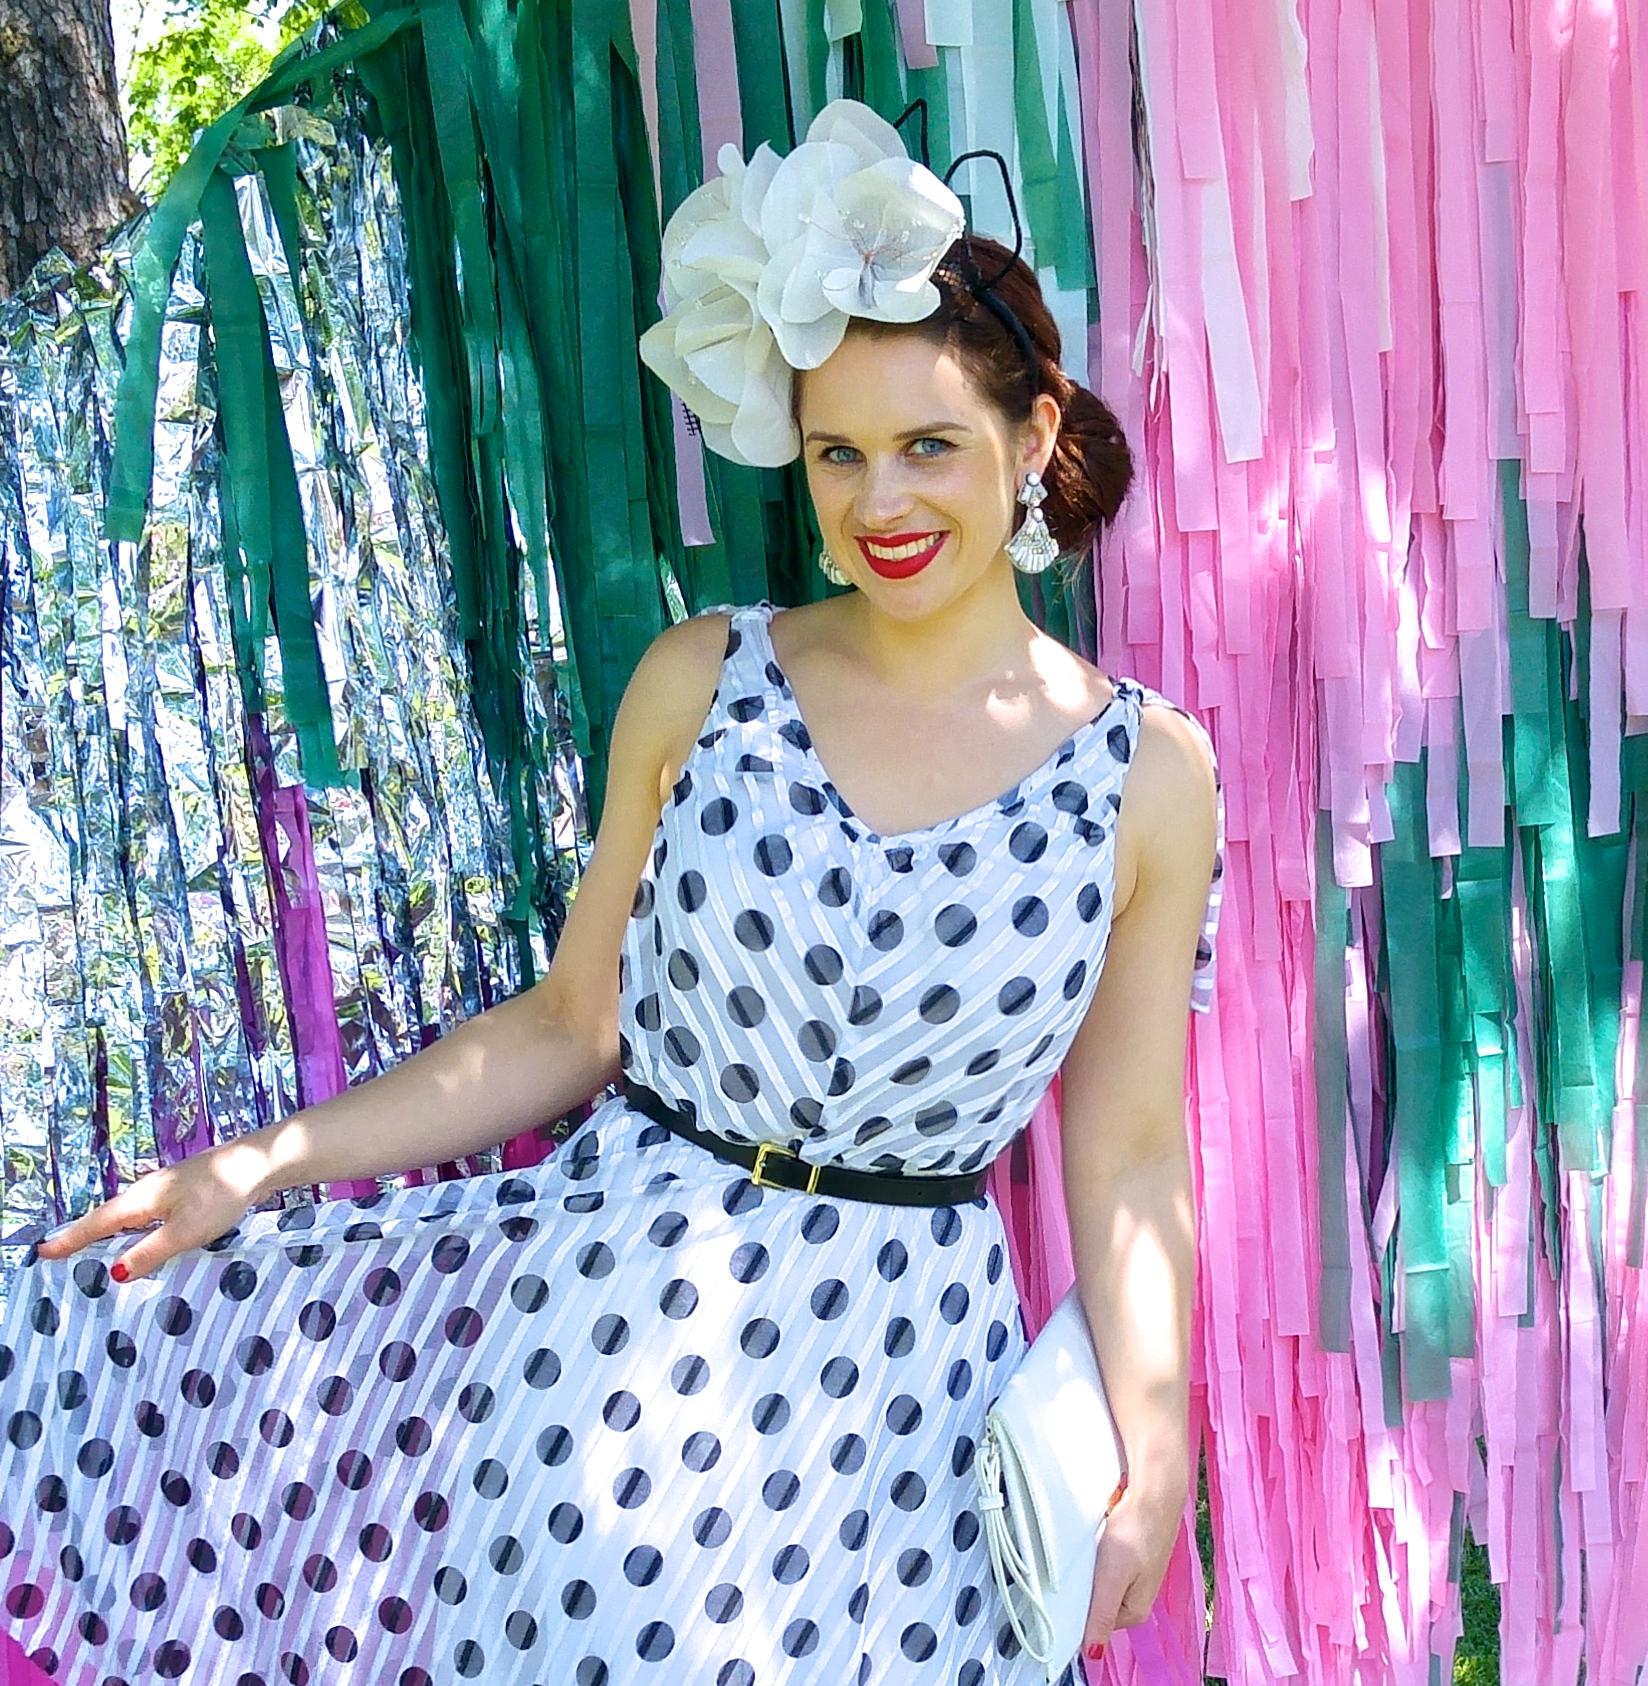 polka-dot-dress-spring-races